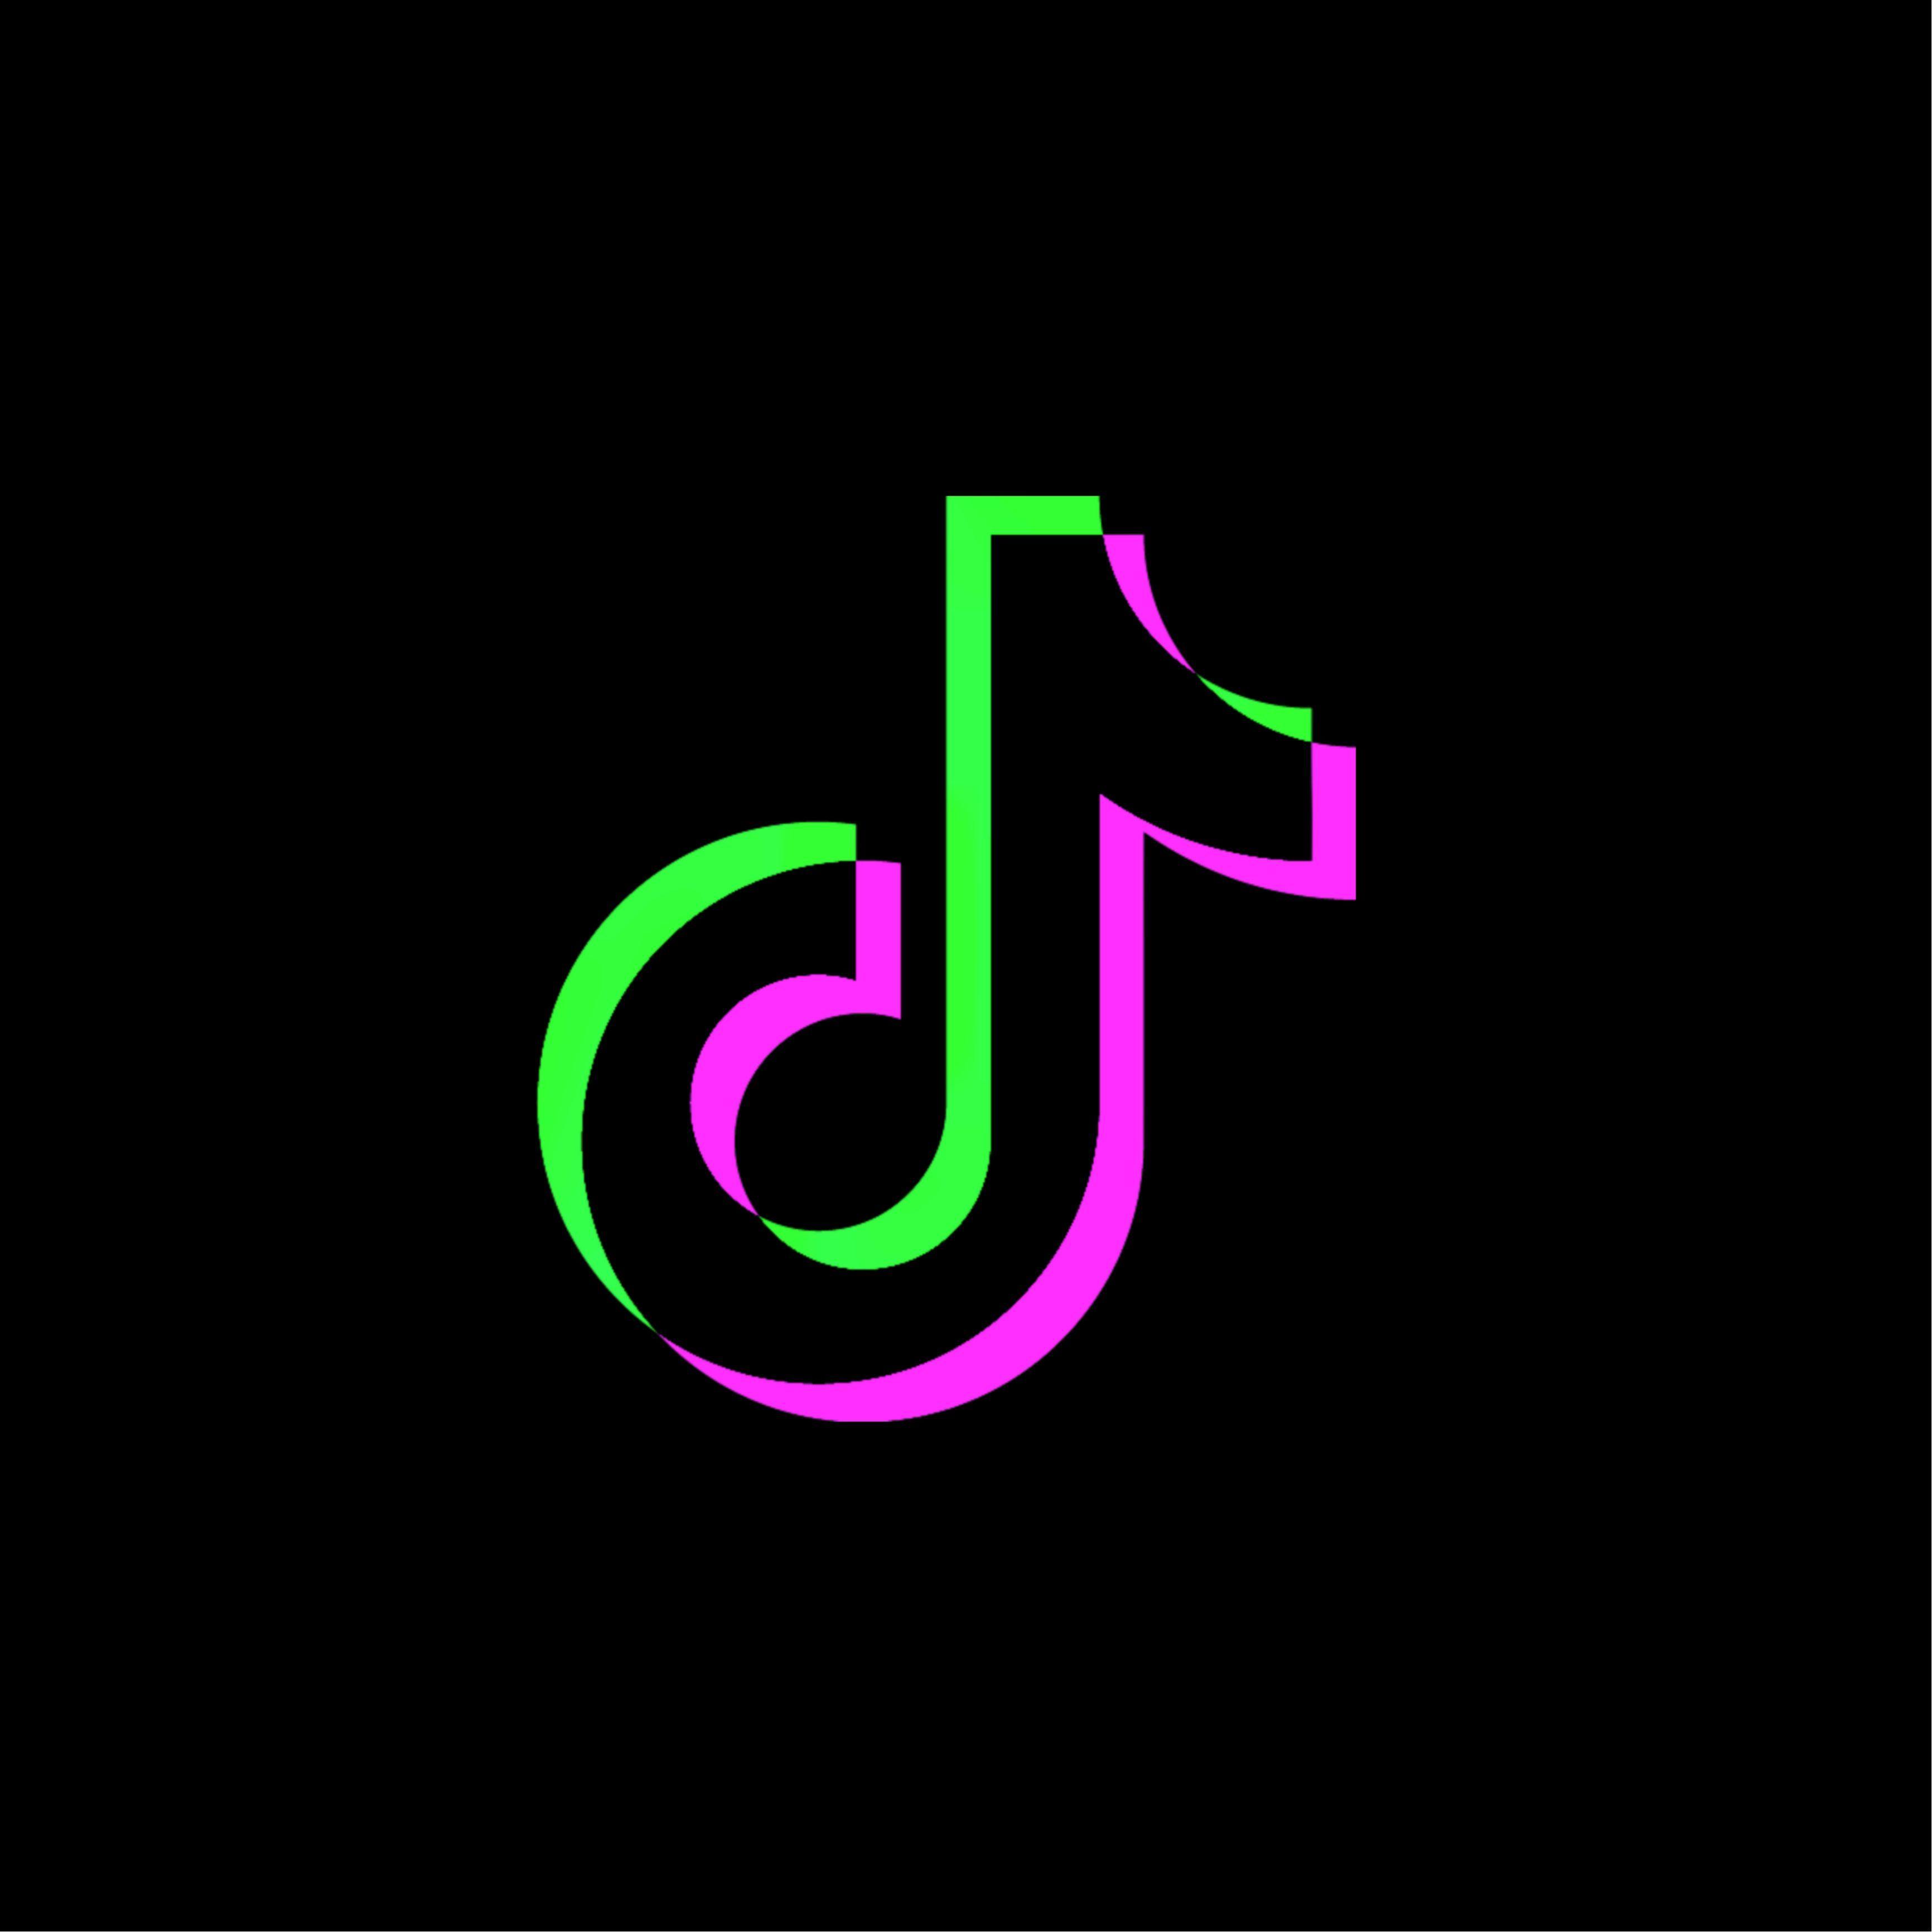 Free Tiktok Followers And Likes Generator In 2021 Cute Emoji Wallpaper Spotify Logo Neon Aesthetic